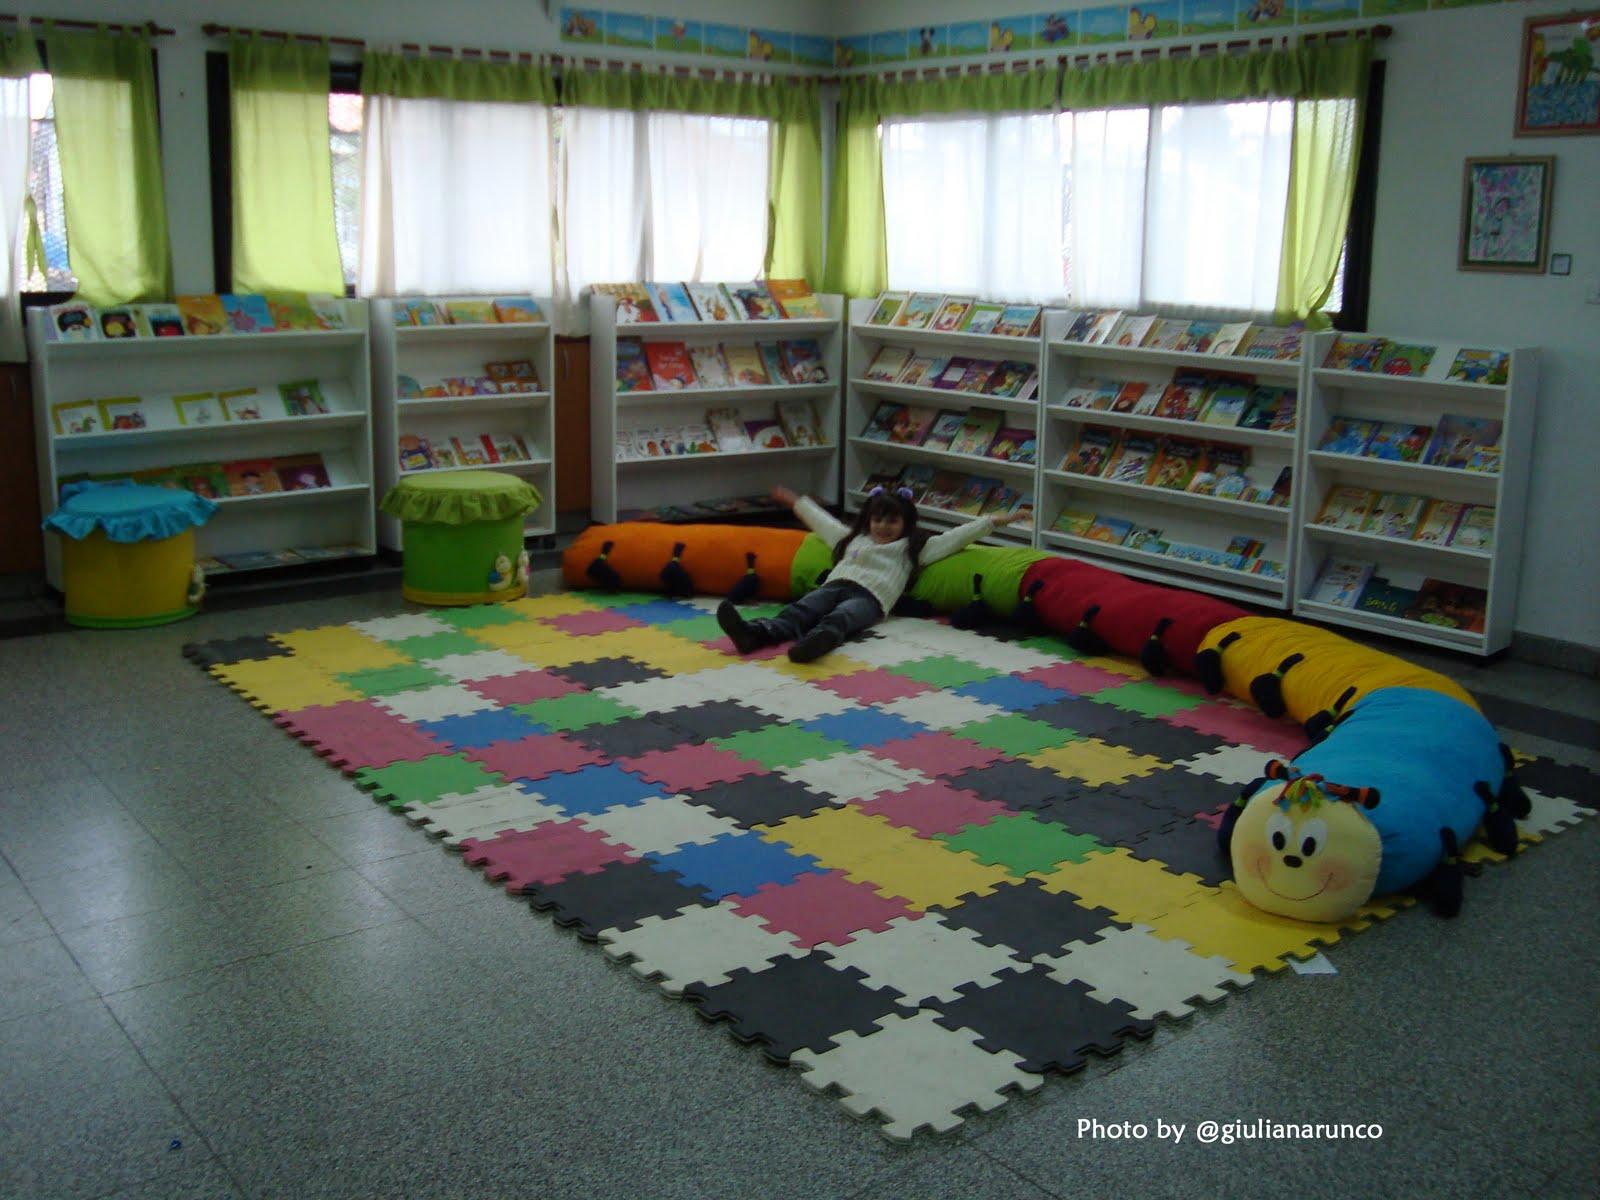 Playhouse disney y fundaci n leer inauguran biblioteca en for Decoracion jardin maternal